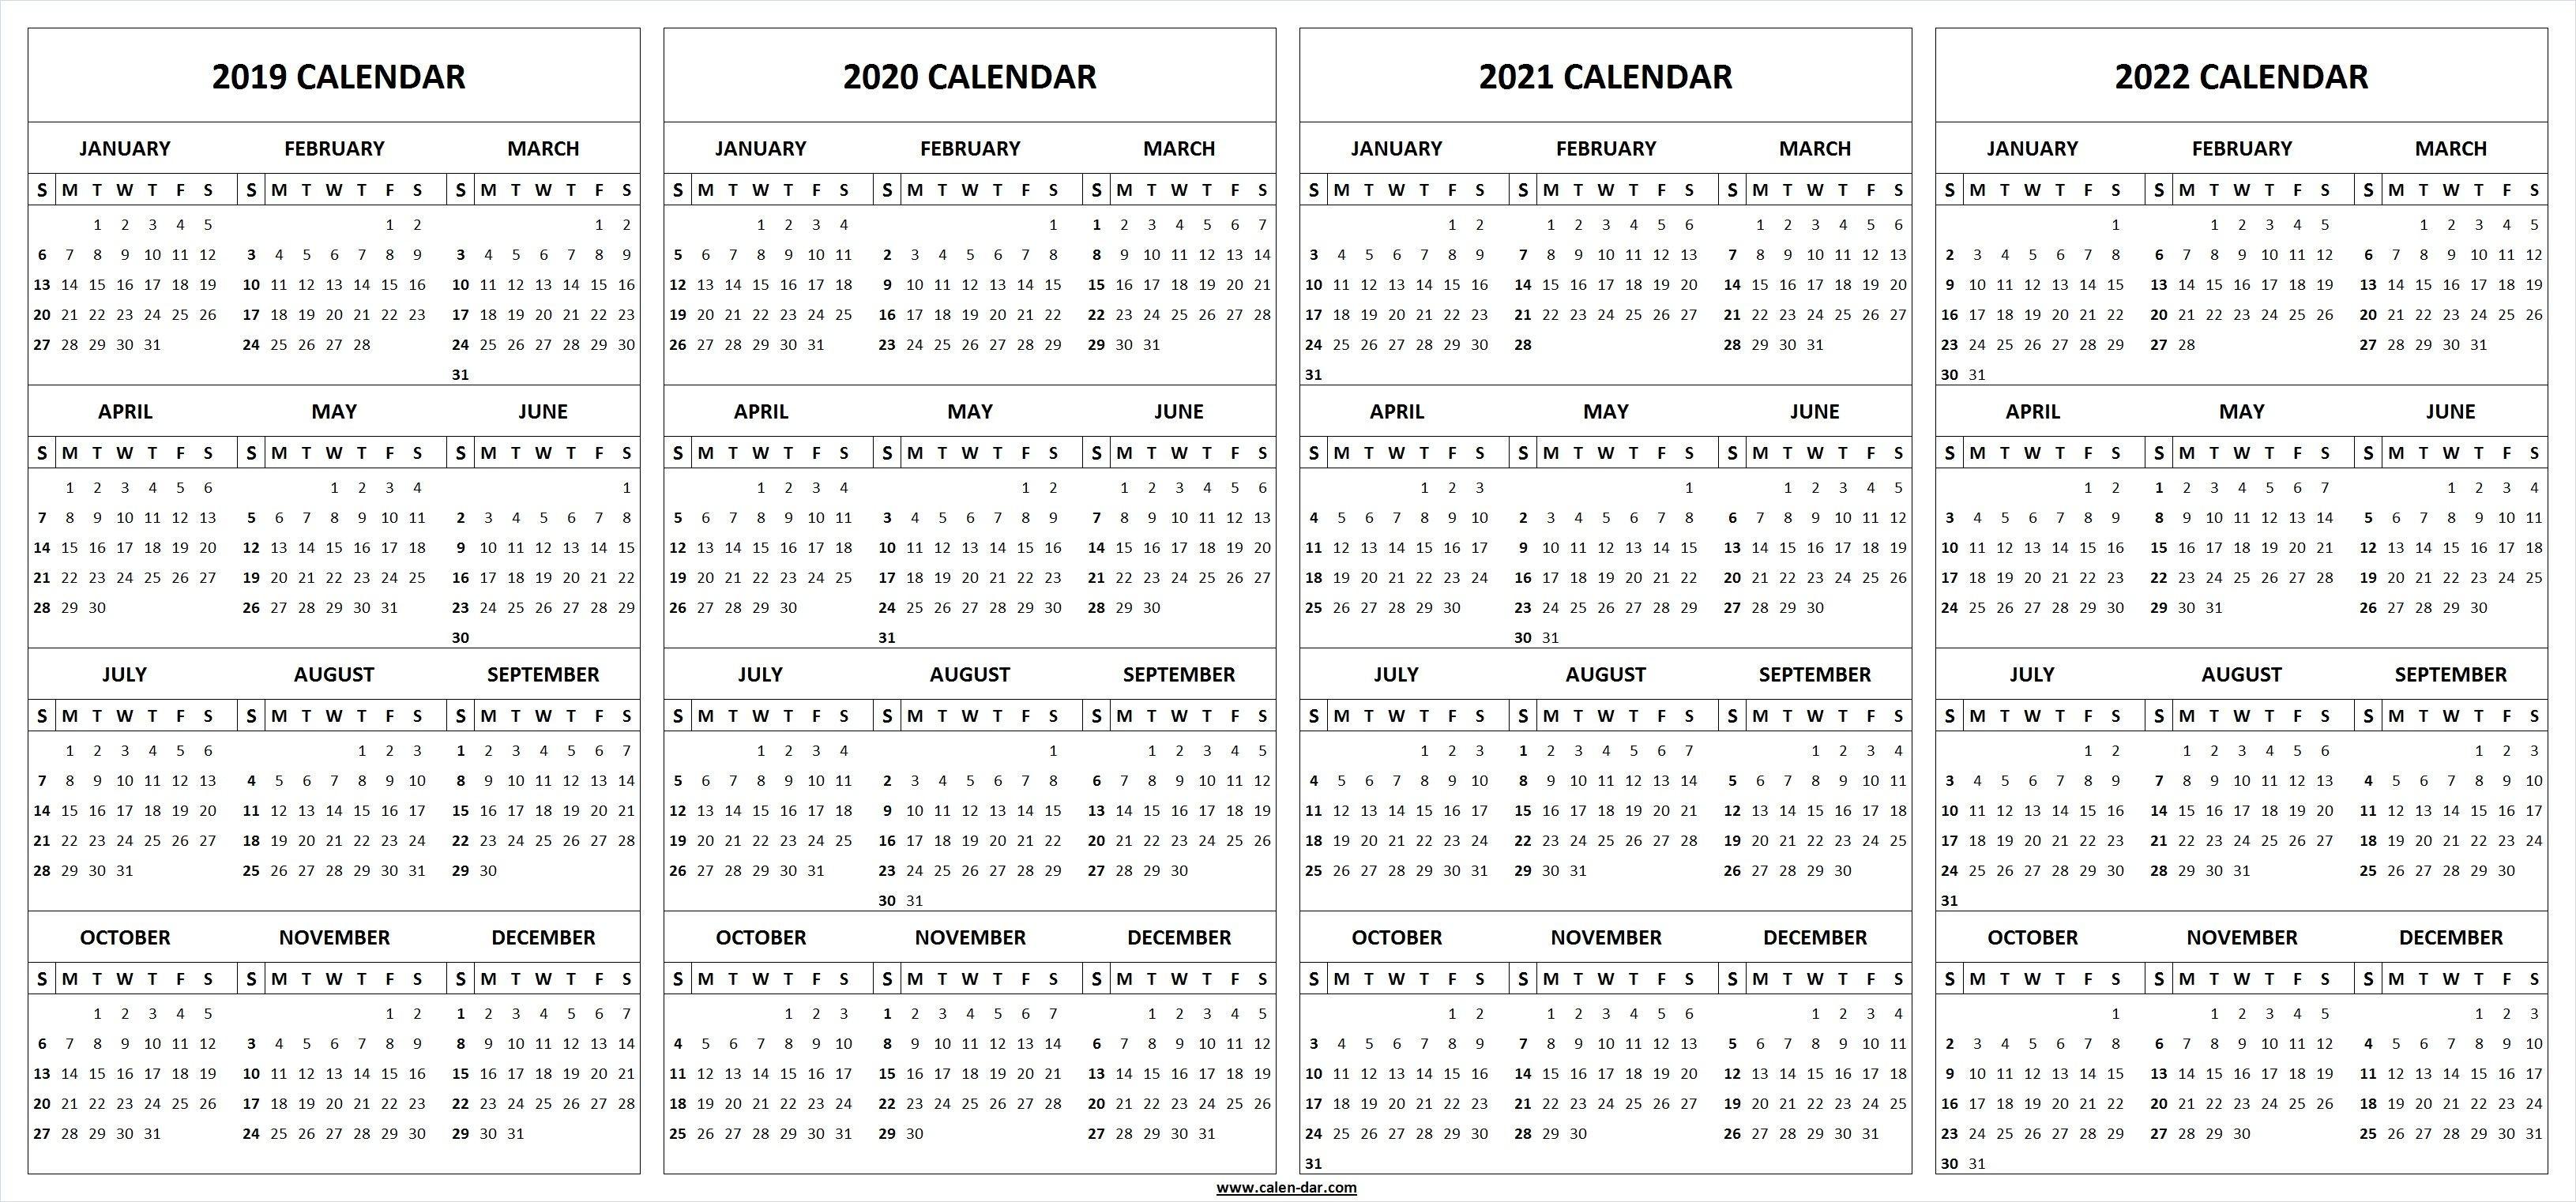 2019 2020 2021 2022 Calendar Blank Template | Calendar-Create 2020 - 2021 Blank Monthly Calendar